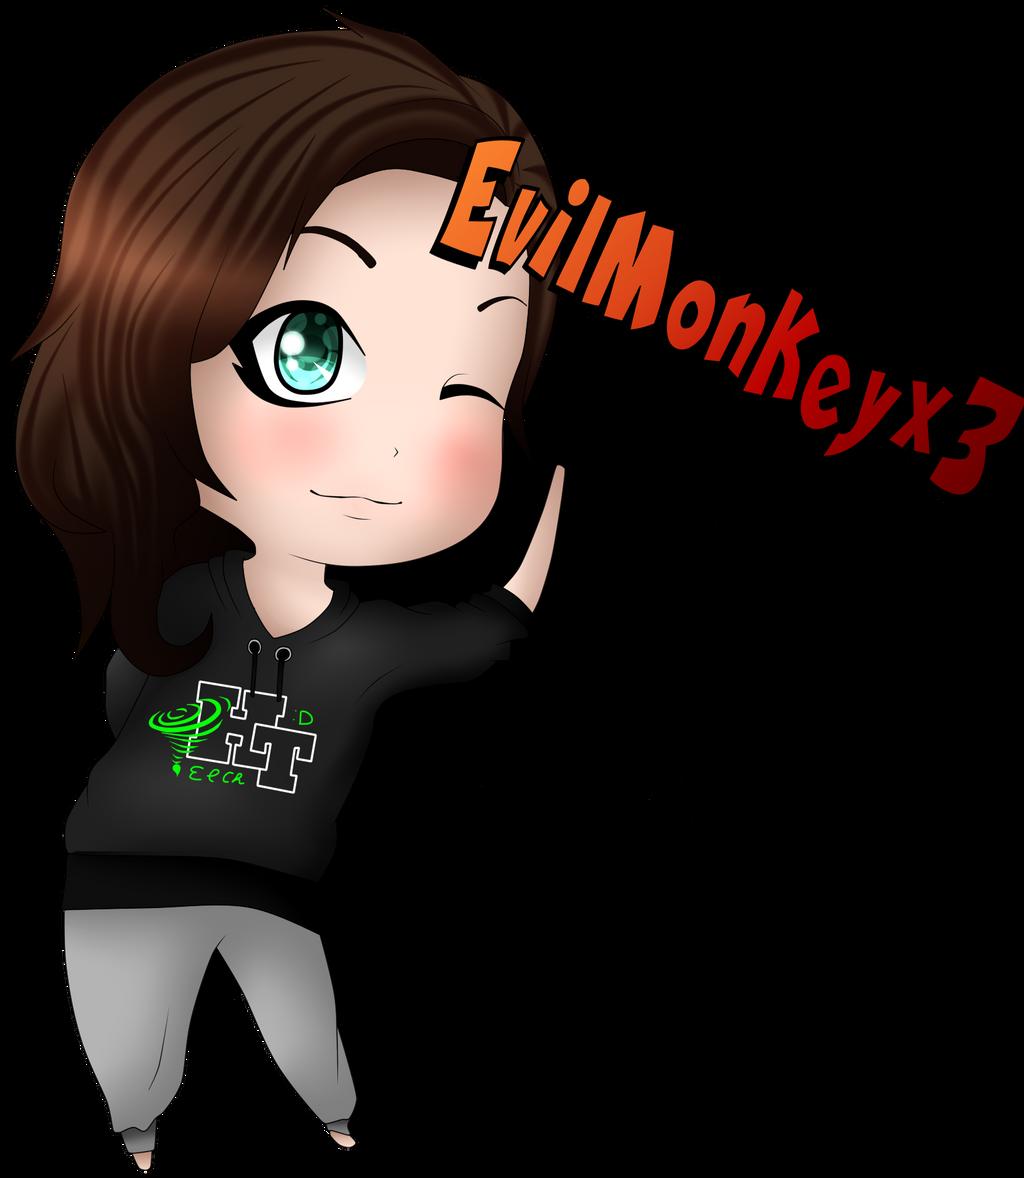 EvilMonkeyx3's Profile Picture